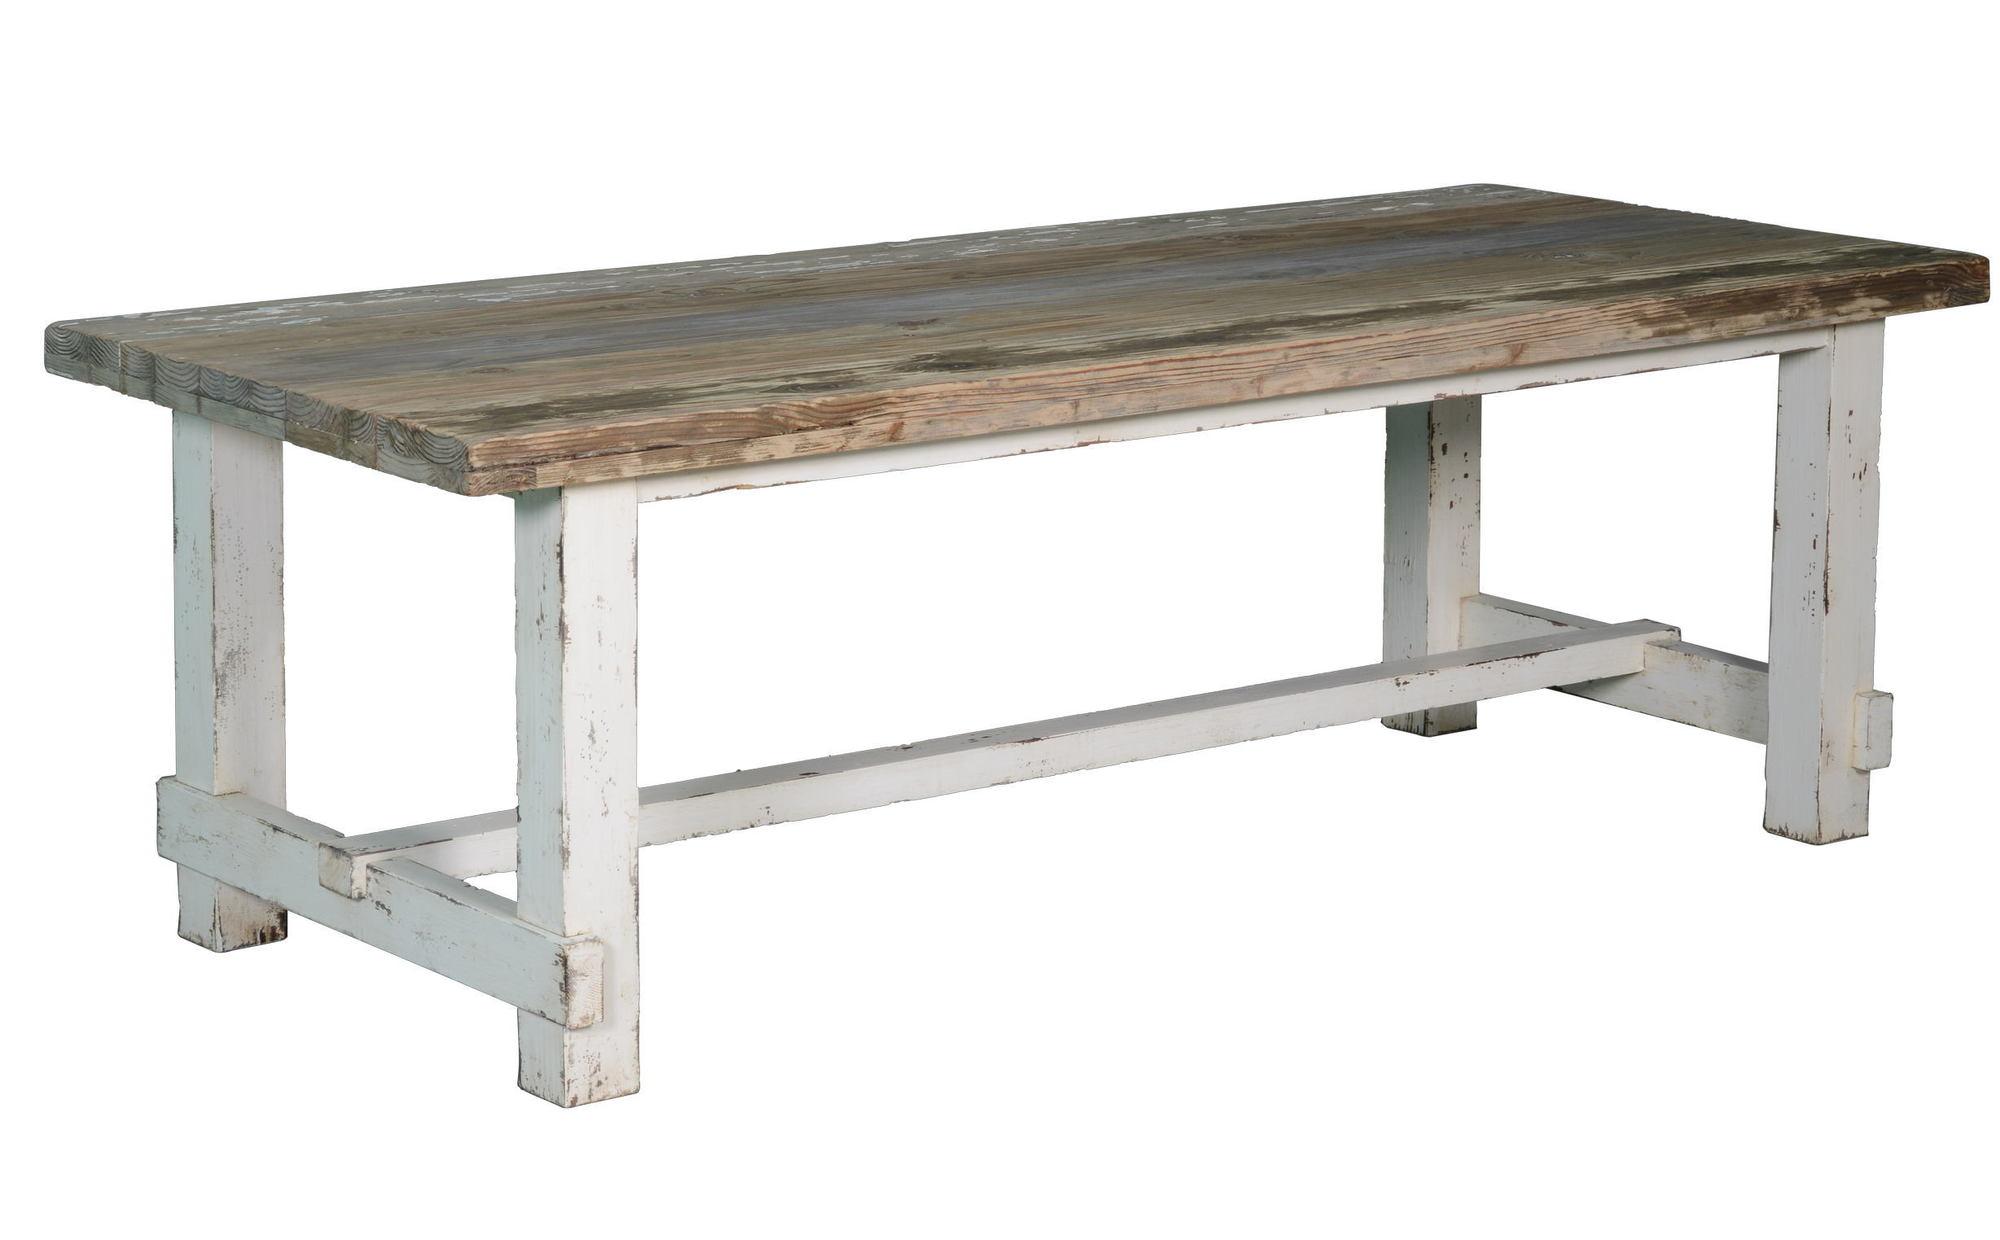 tafel-daan-towerliving-KL 0111 - KL 0113-landelijk